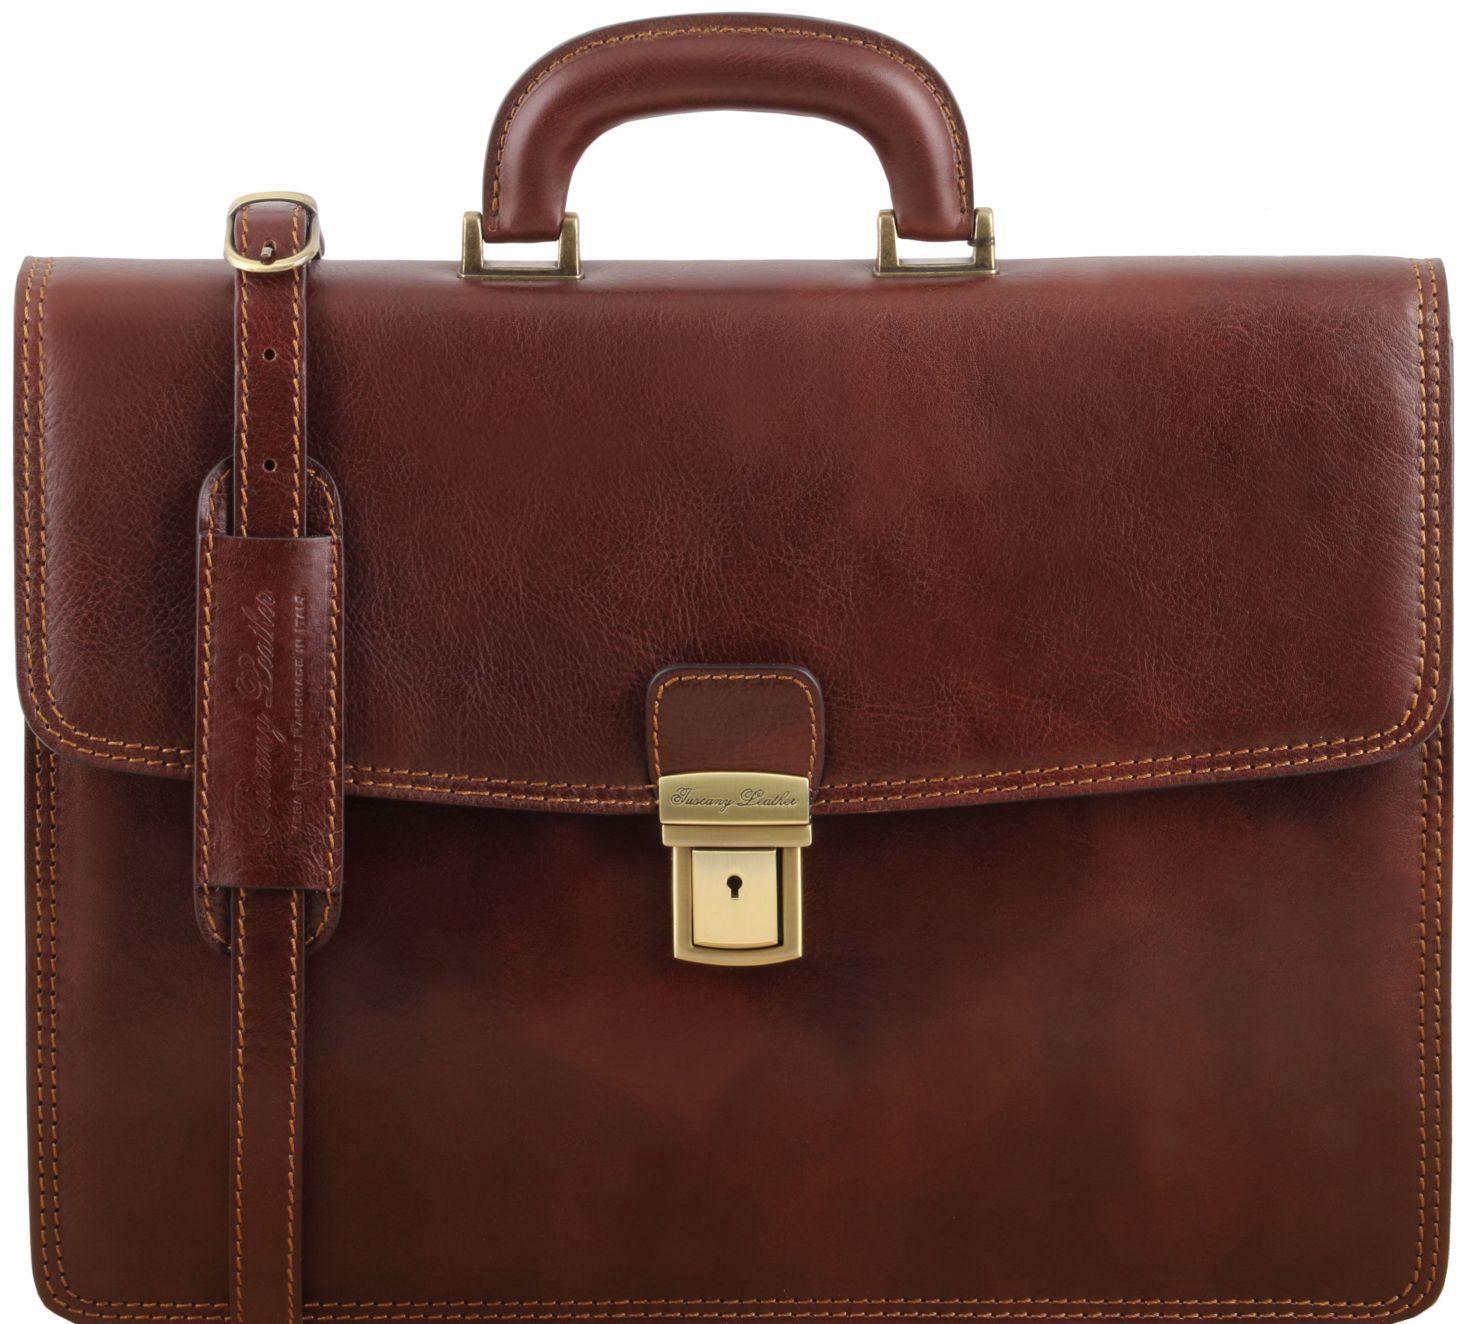 39f6adf007 Ανδρική Επαγγελματική Τσάντα Δερμάτινη Amalfi Καφέ Tuscany Leather ...